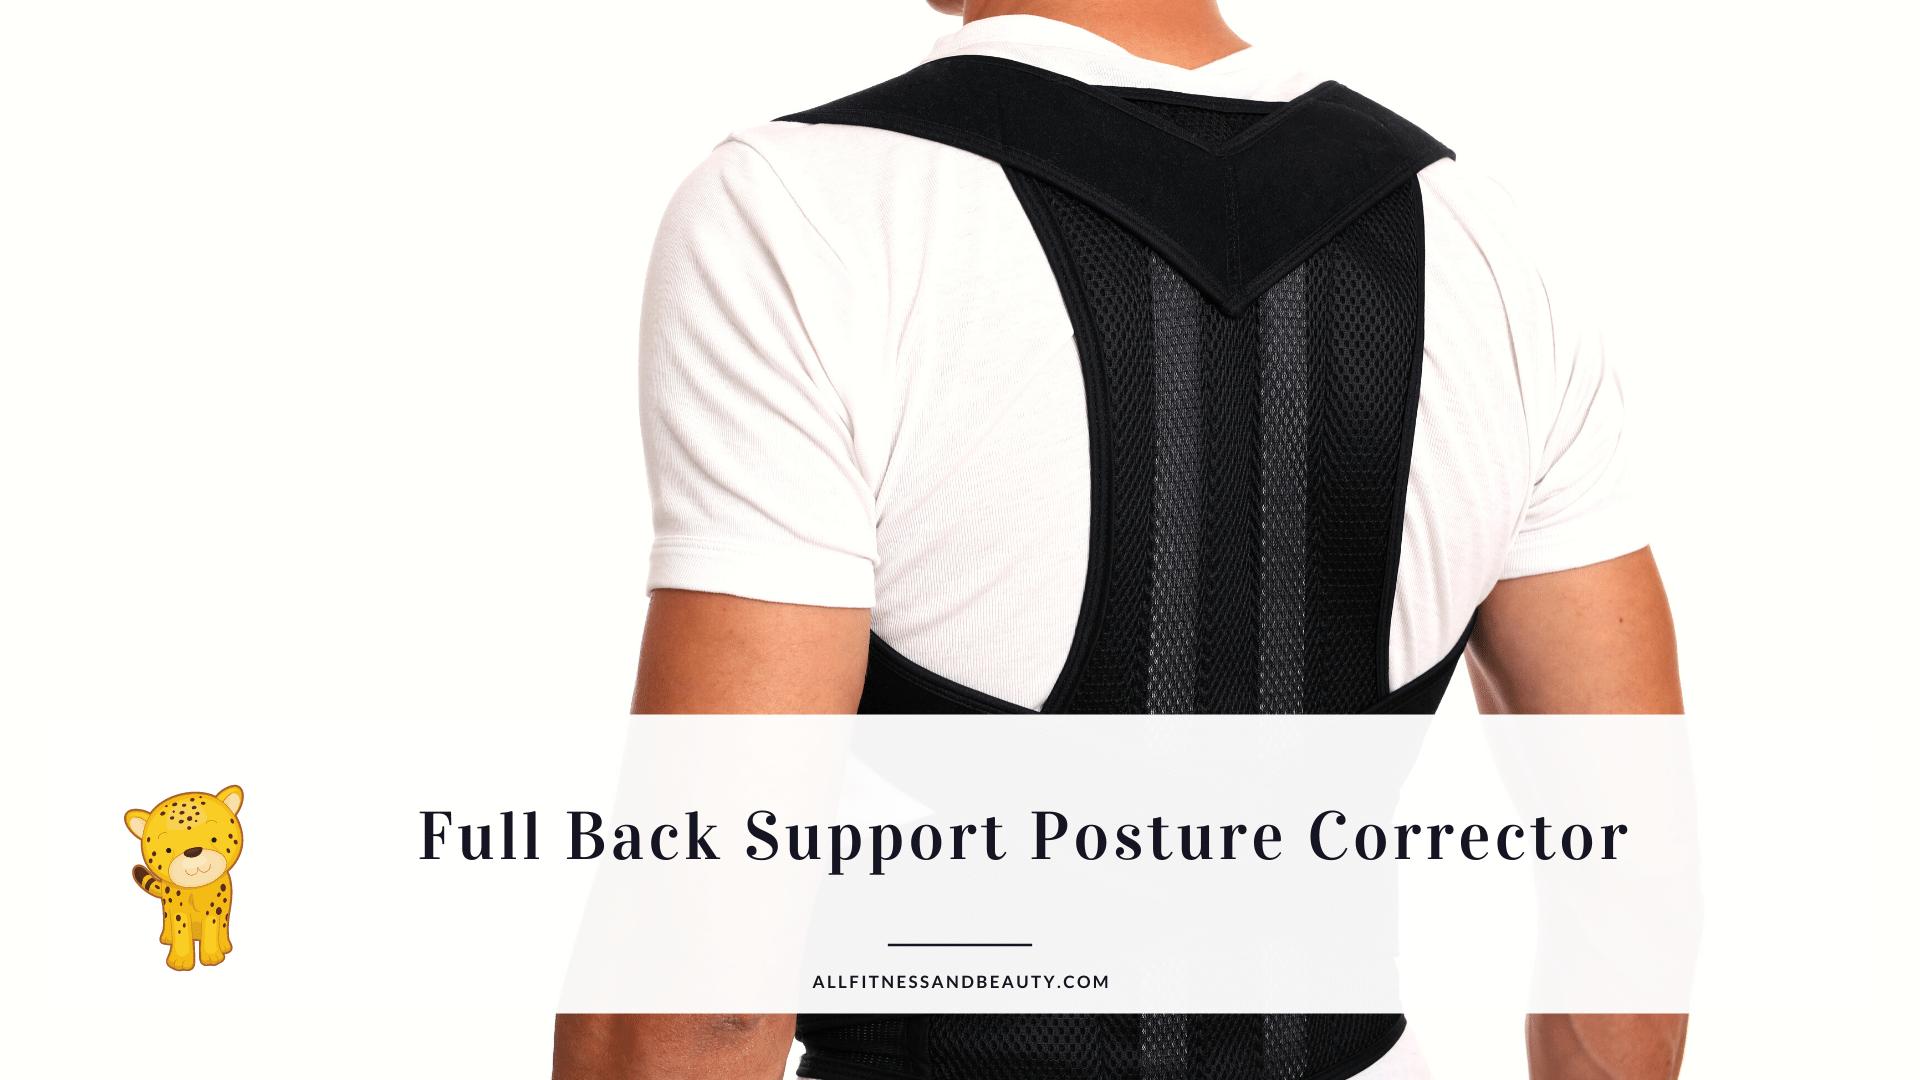 full back support posture corrector